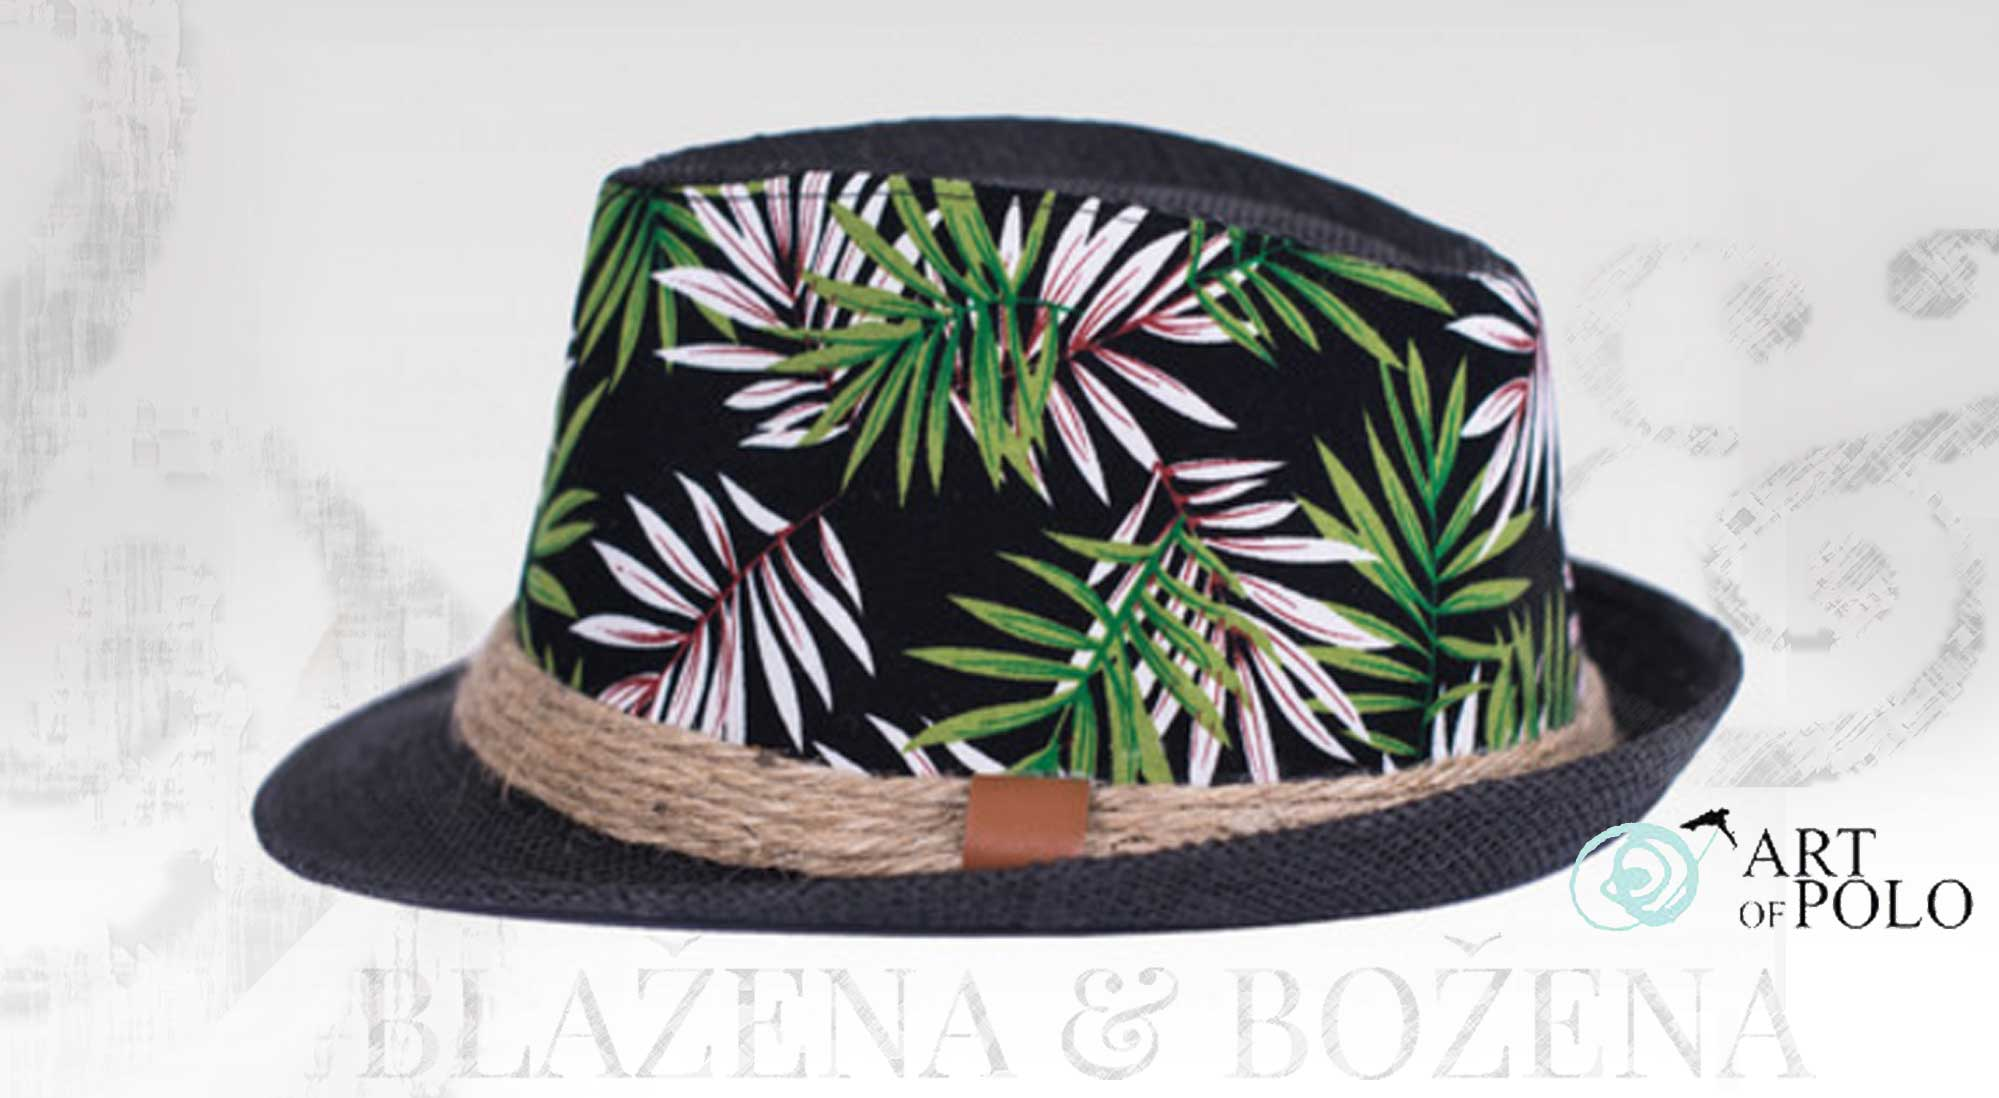 Grenada – černý klobouk se vzorem – Blažena Božena 2101f5e31e